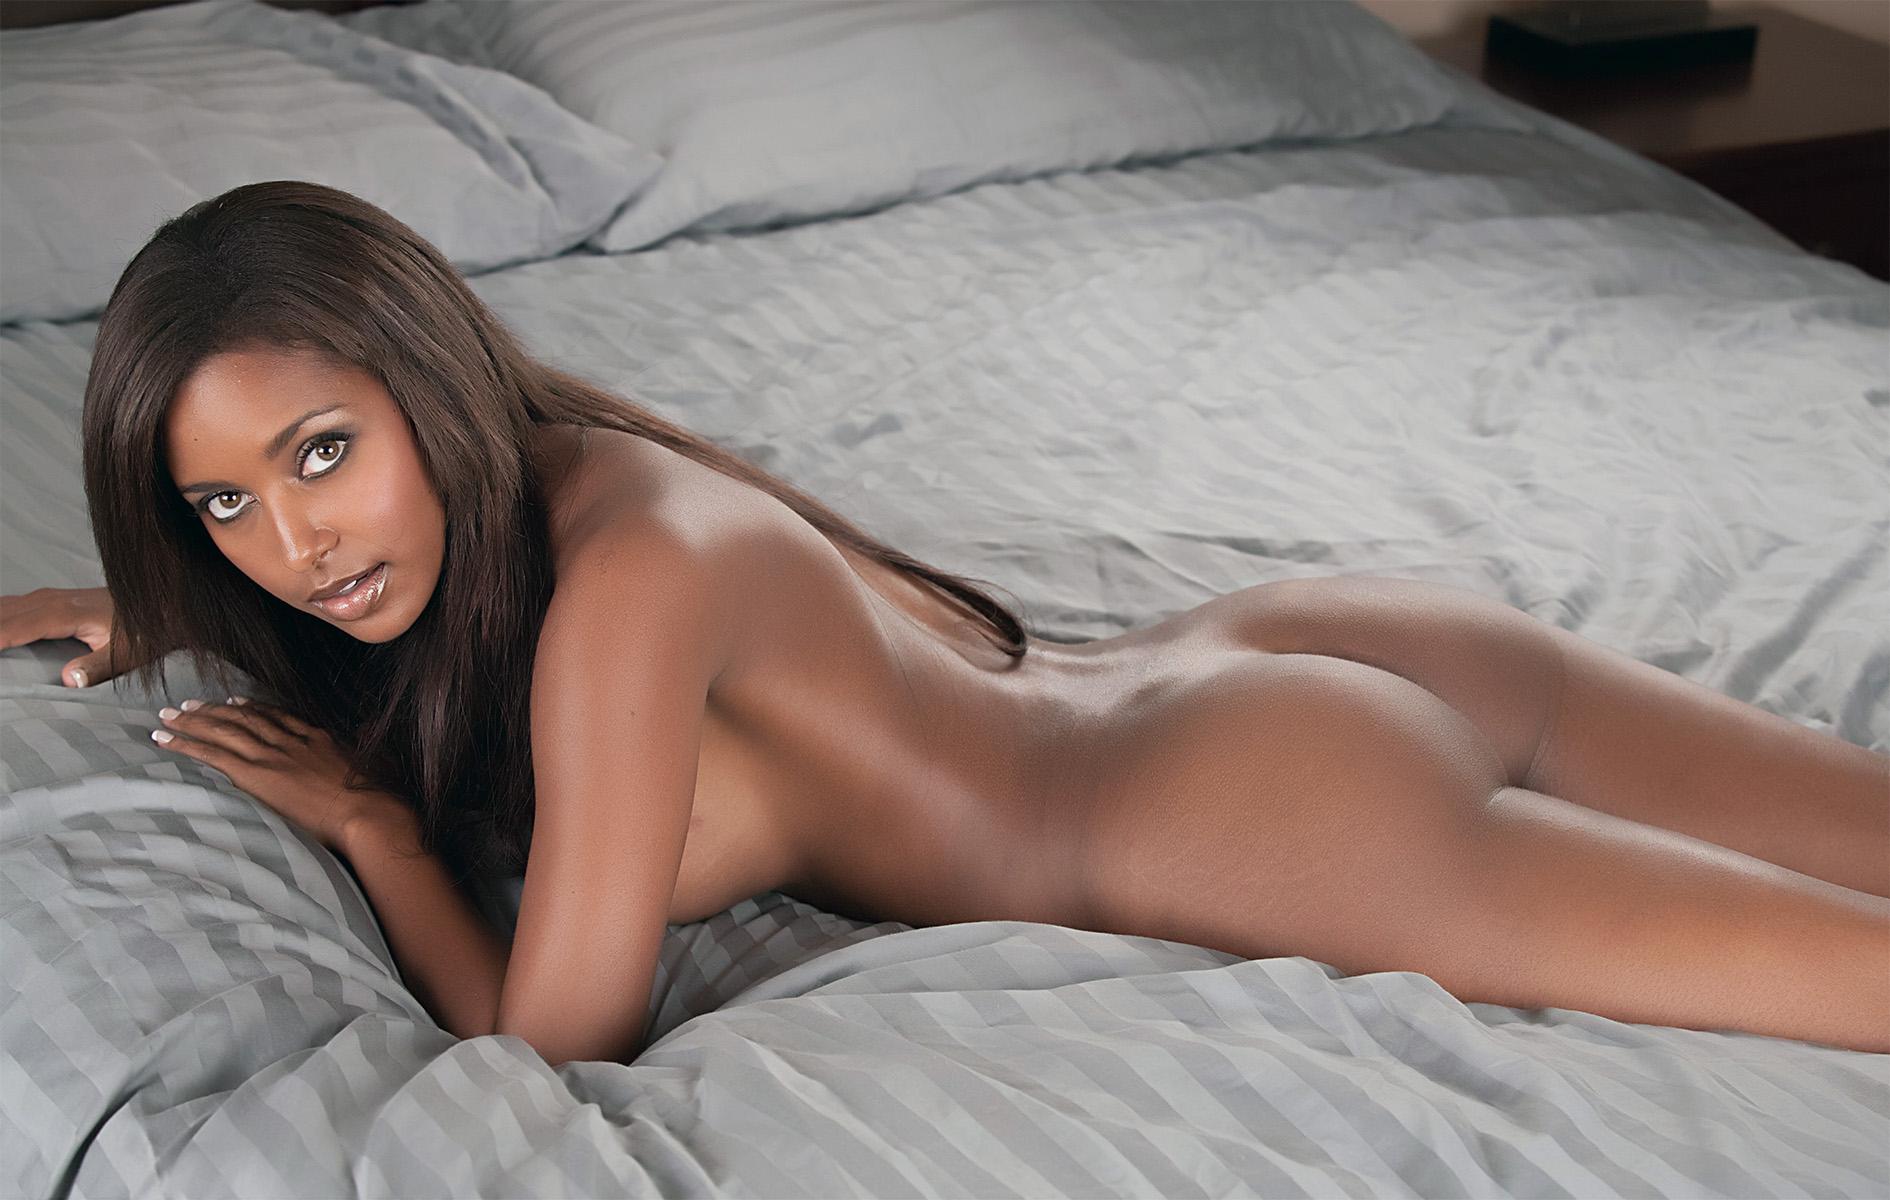 Wwe Brandi Rhodes Nude Photos Leaked - Celebrity Leaks-6913